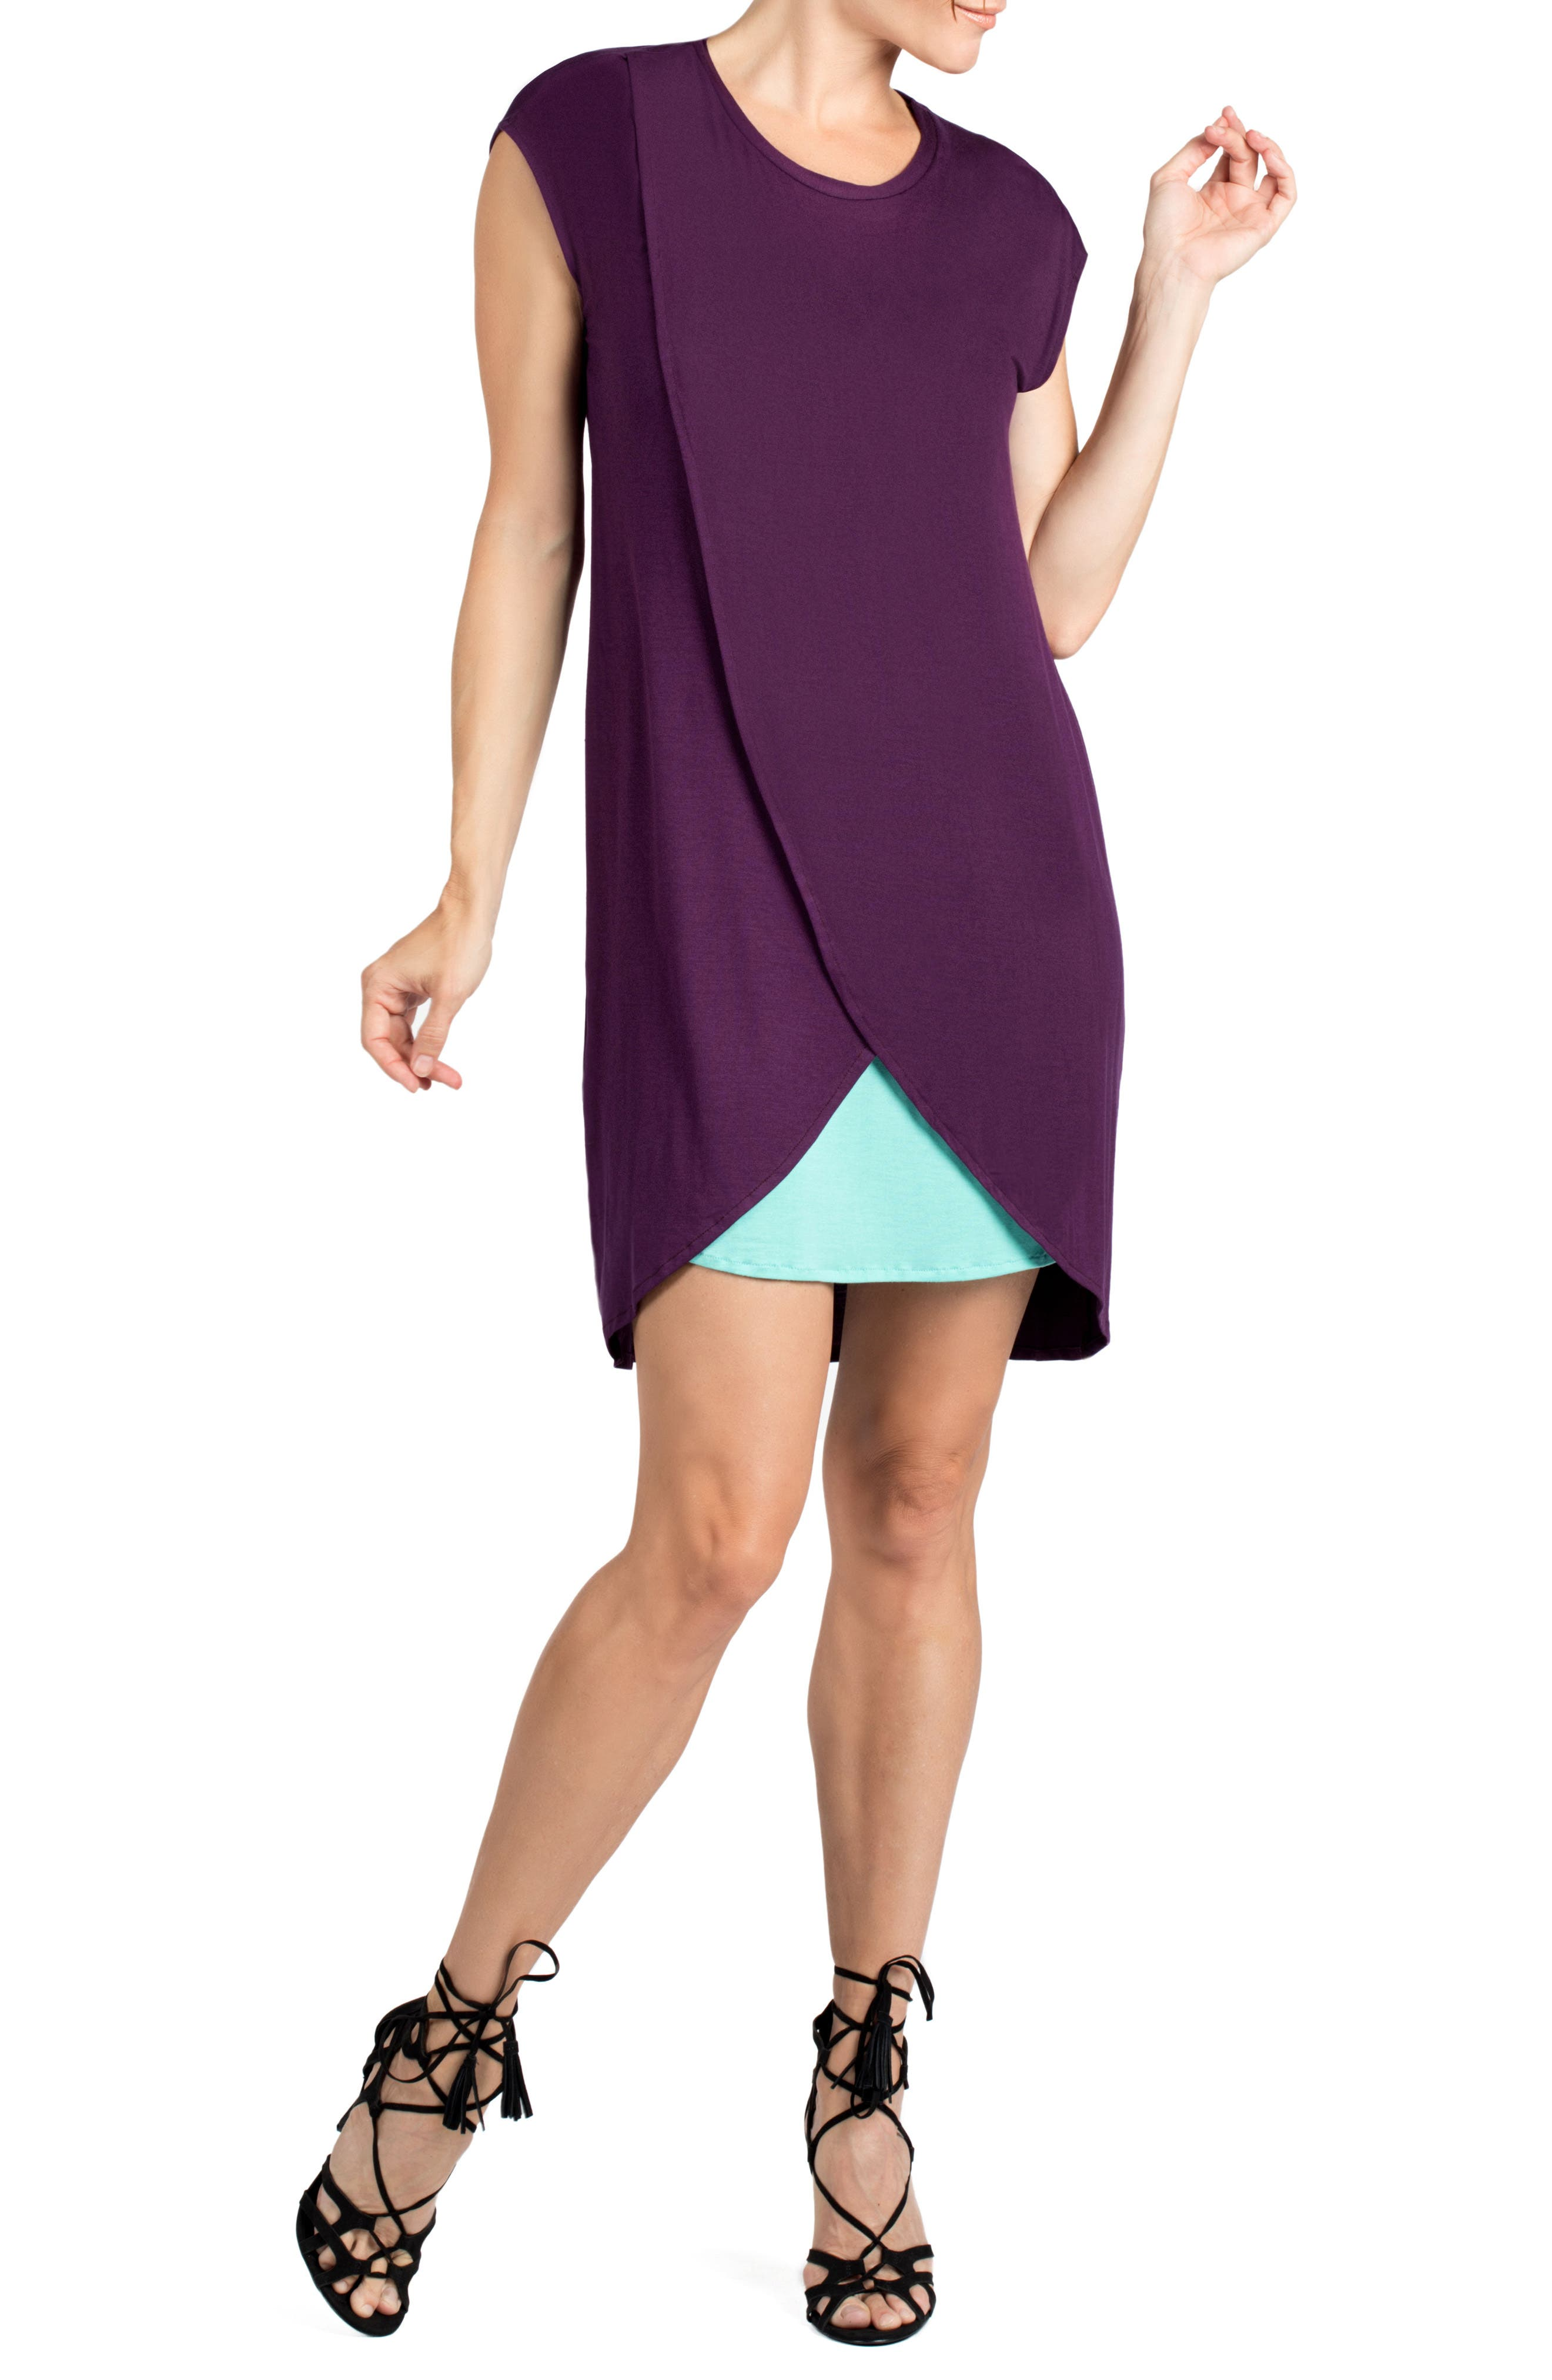 Lille Layered Maternity/Nursing Sheath Dress,                         Main,                         color, EGGPLANT/ DARK MINT CONTRAST